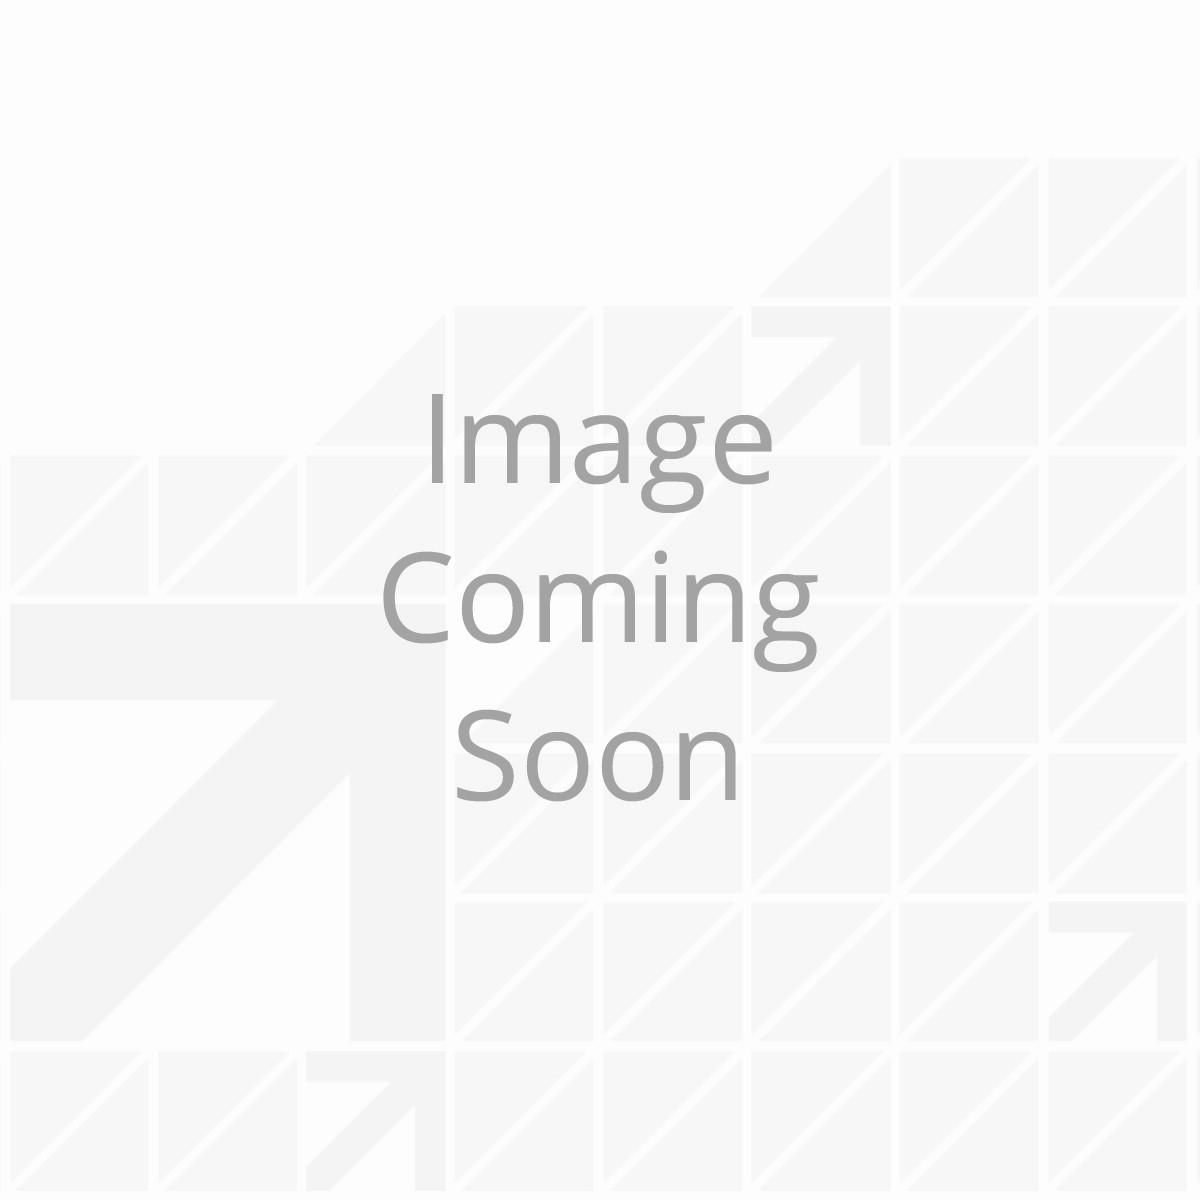 359461_-_pg_leveling_service_kit_-_001